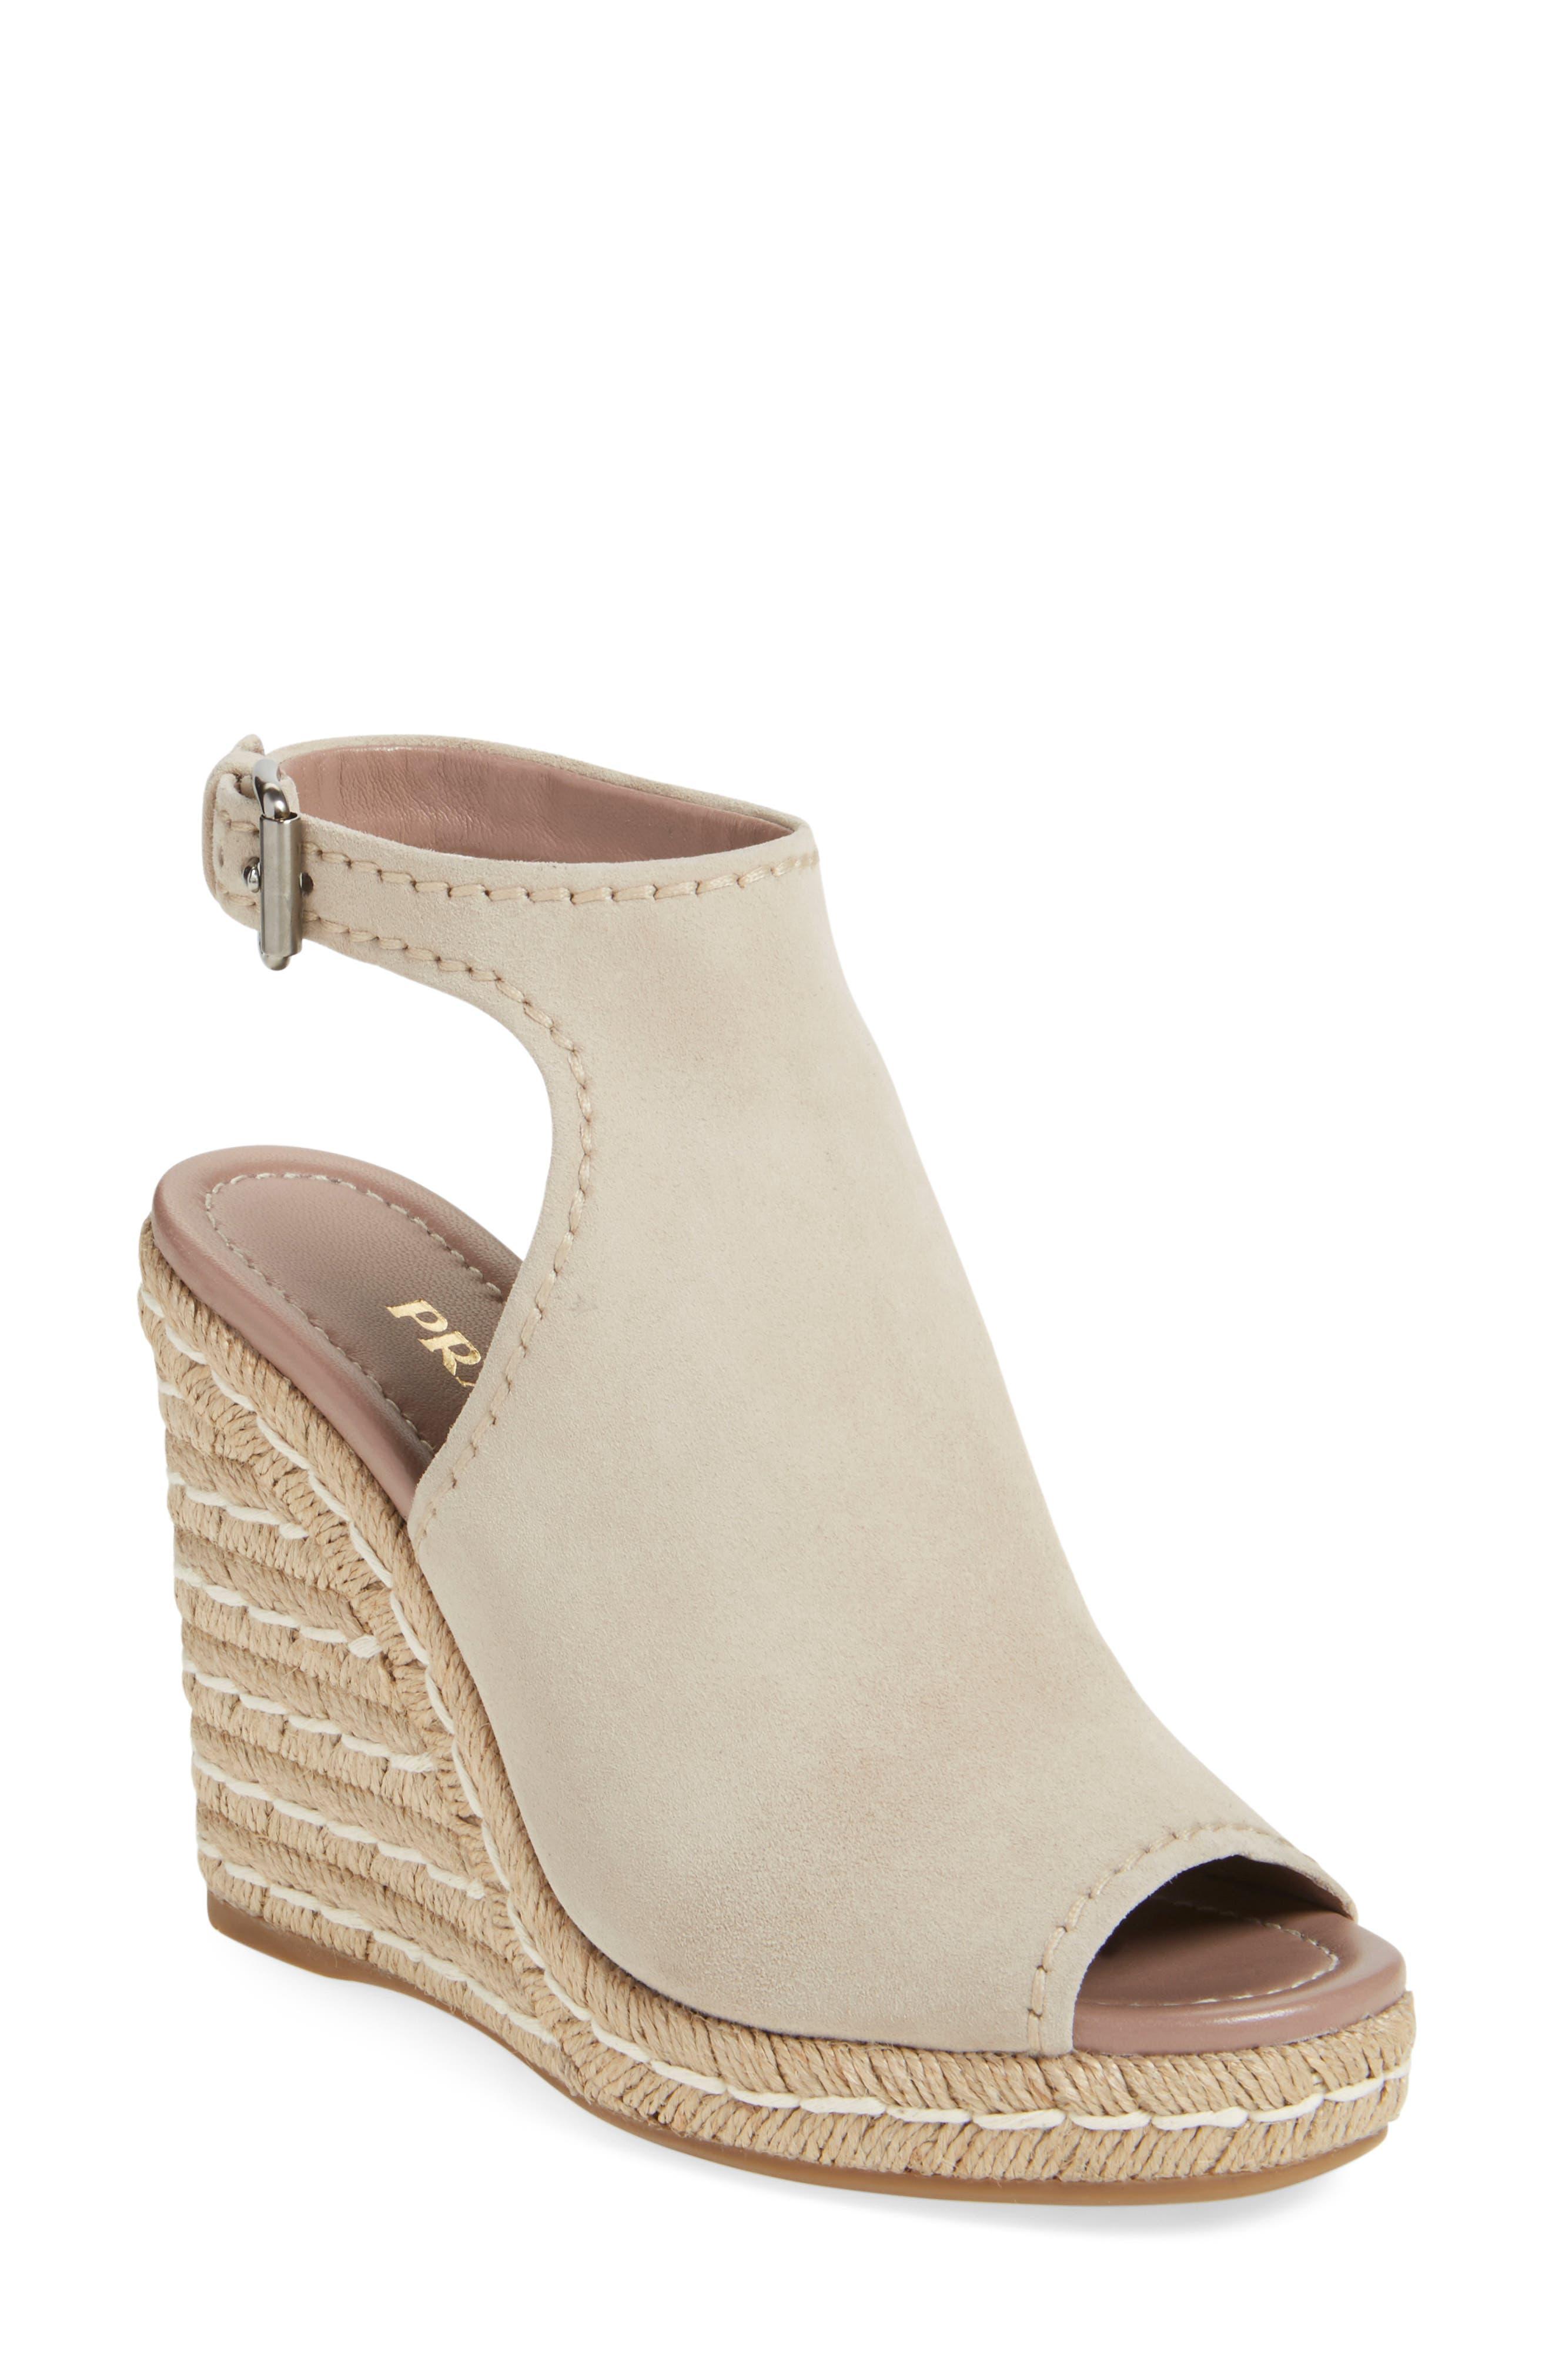 Ankle Strap Espadrille Wedge Sandal,                             Alternate thumbnail 2, color,                             250